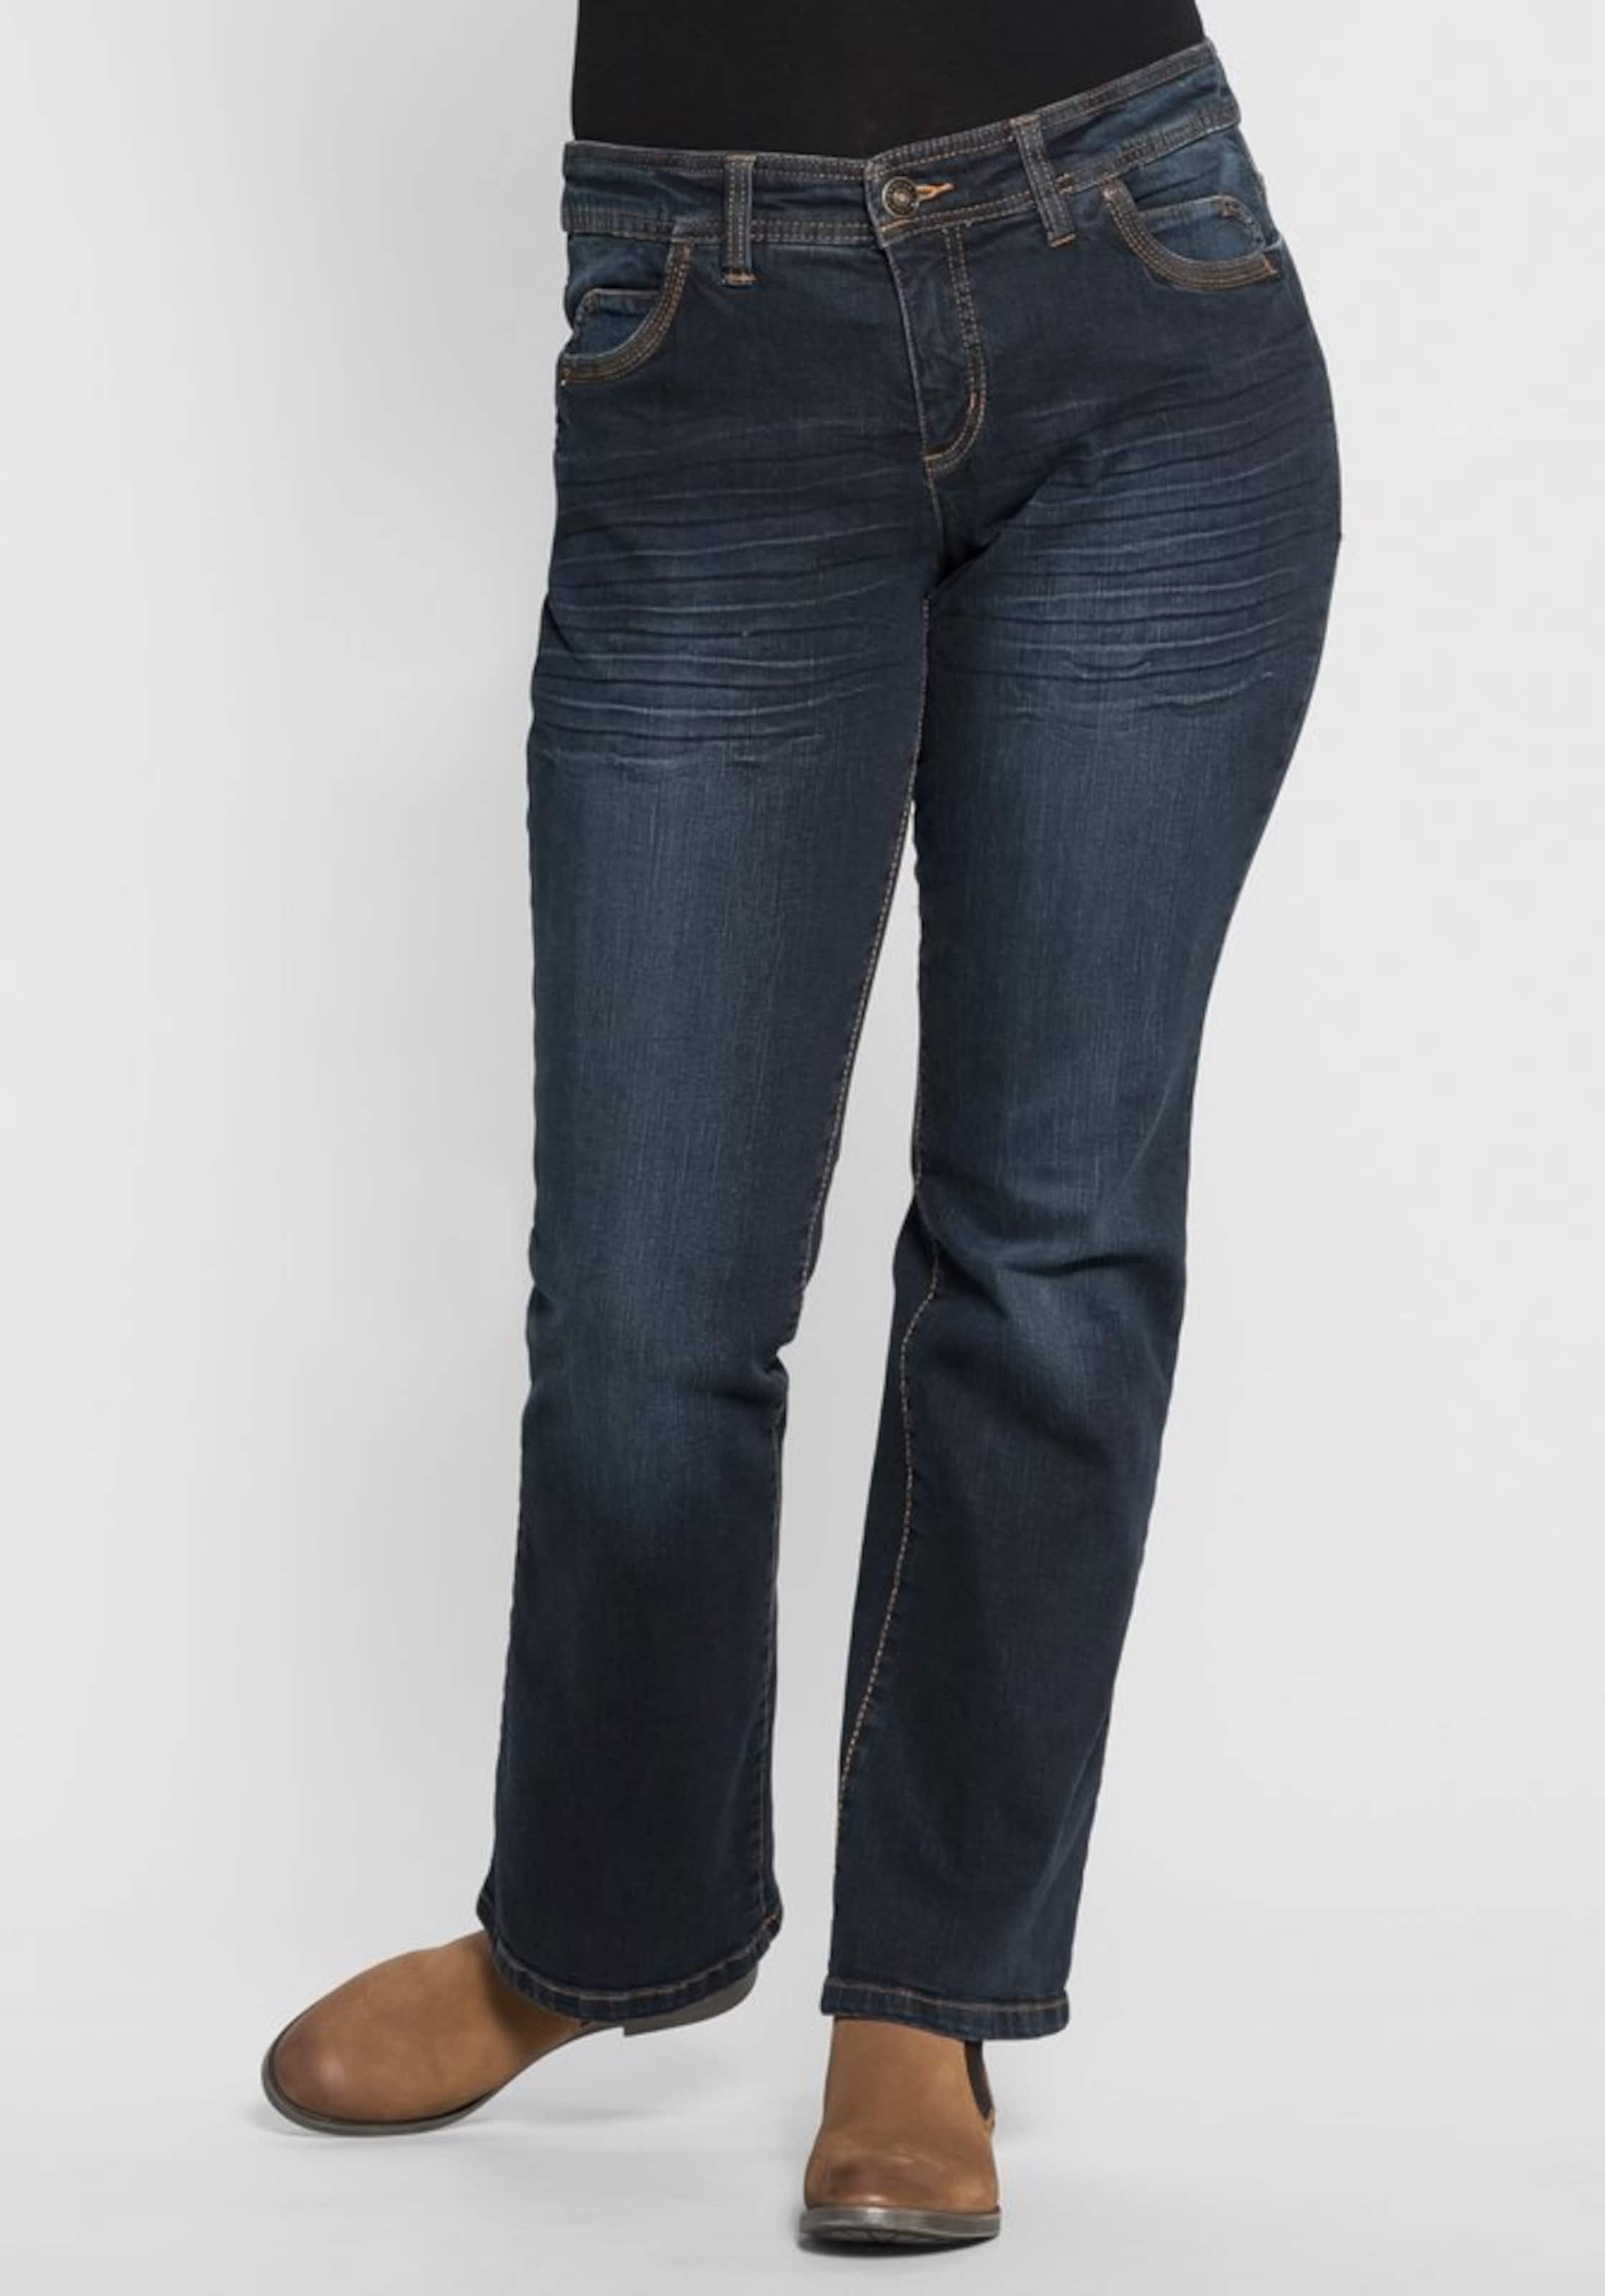 In Denim Jeans Sheego In Dunkelblau Denim Jeans Denim Sheego In Dunkelblau Sheego Jeans dBeCxo